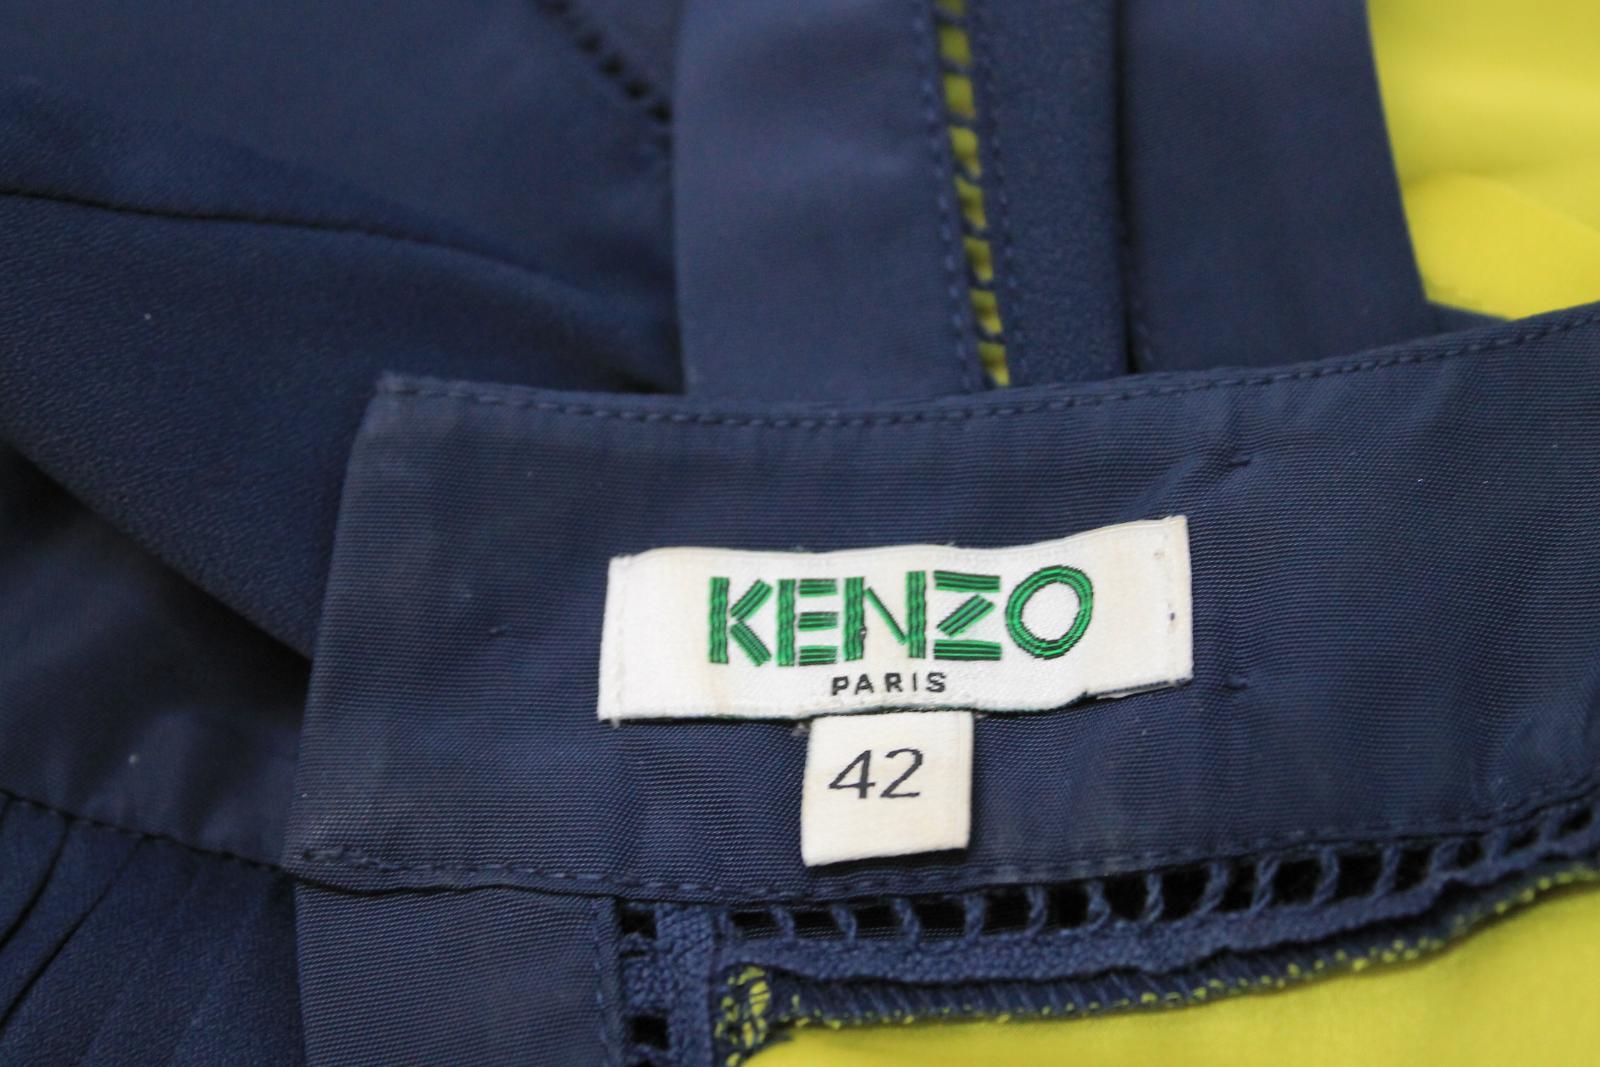 KENZO-PARIS-Ladies-Navy-Blue-Neon-Yellow-Sleeveless-Shift-Dress-FR42-UK14 thumbnail 8